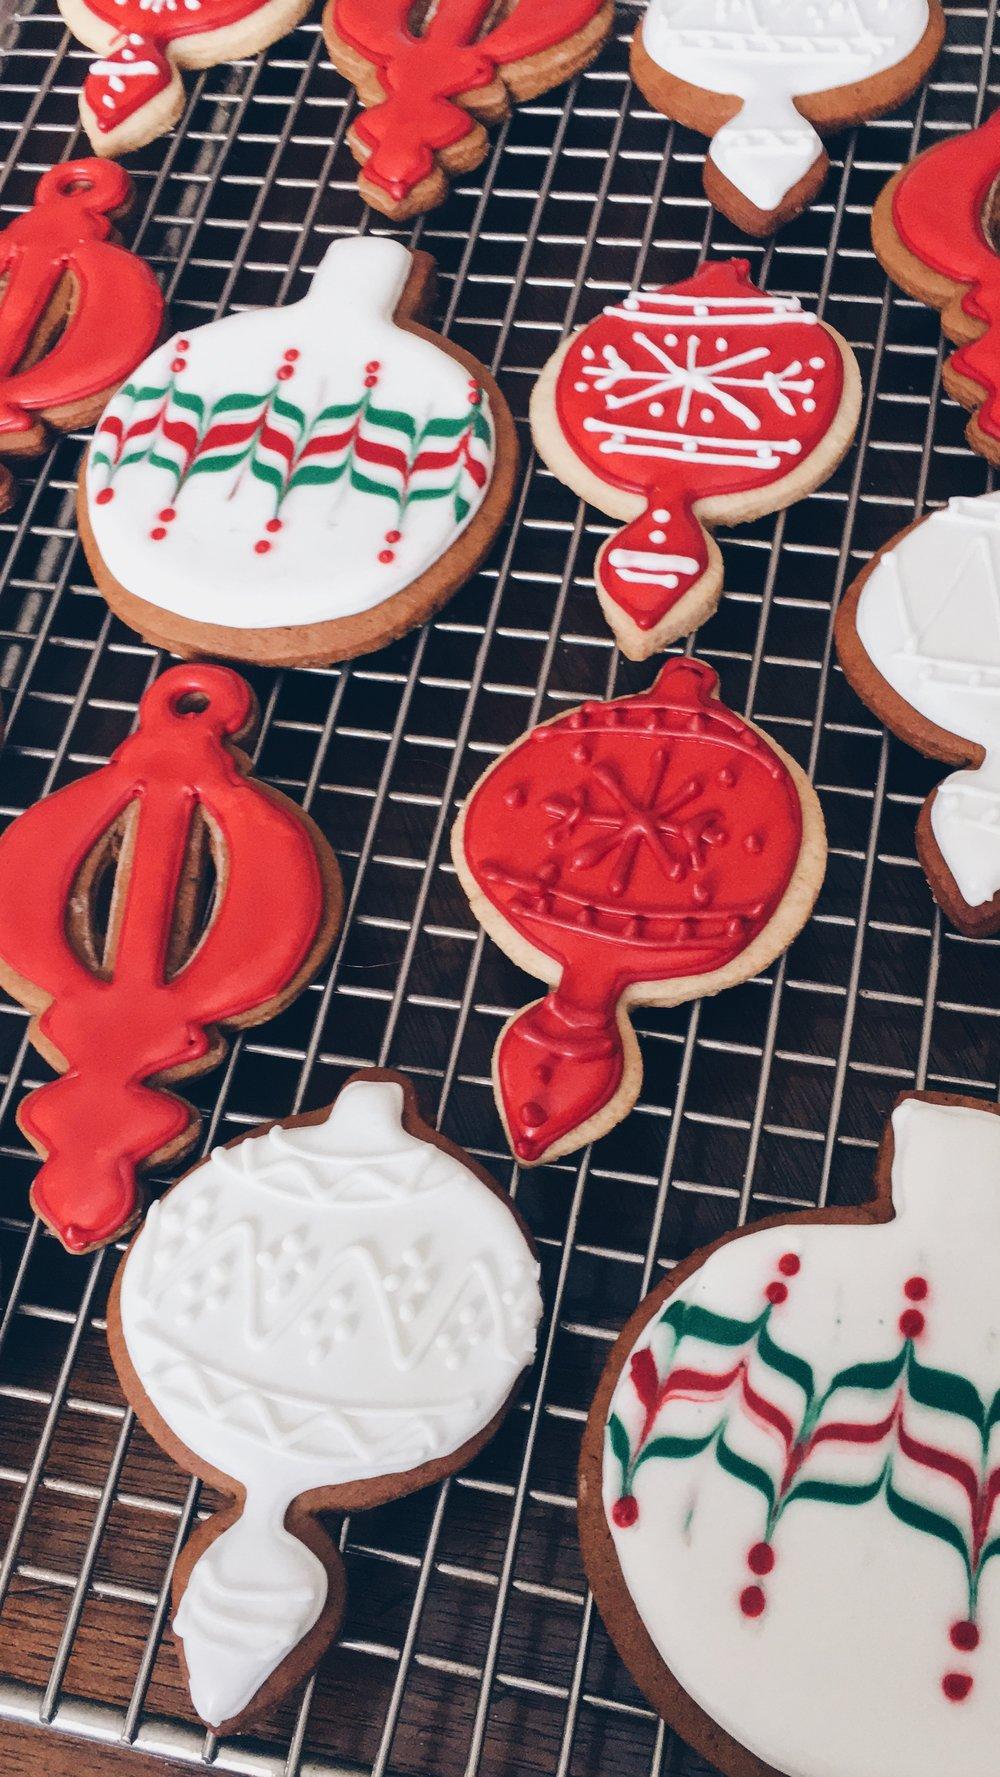 Medium sized cookies